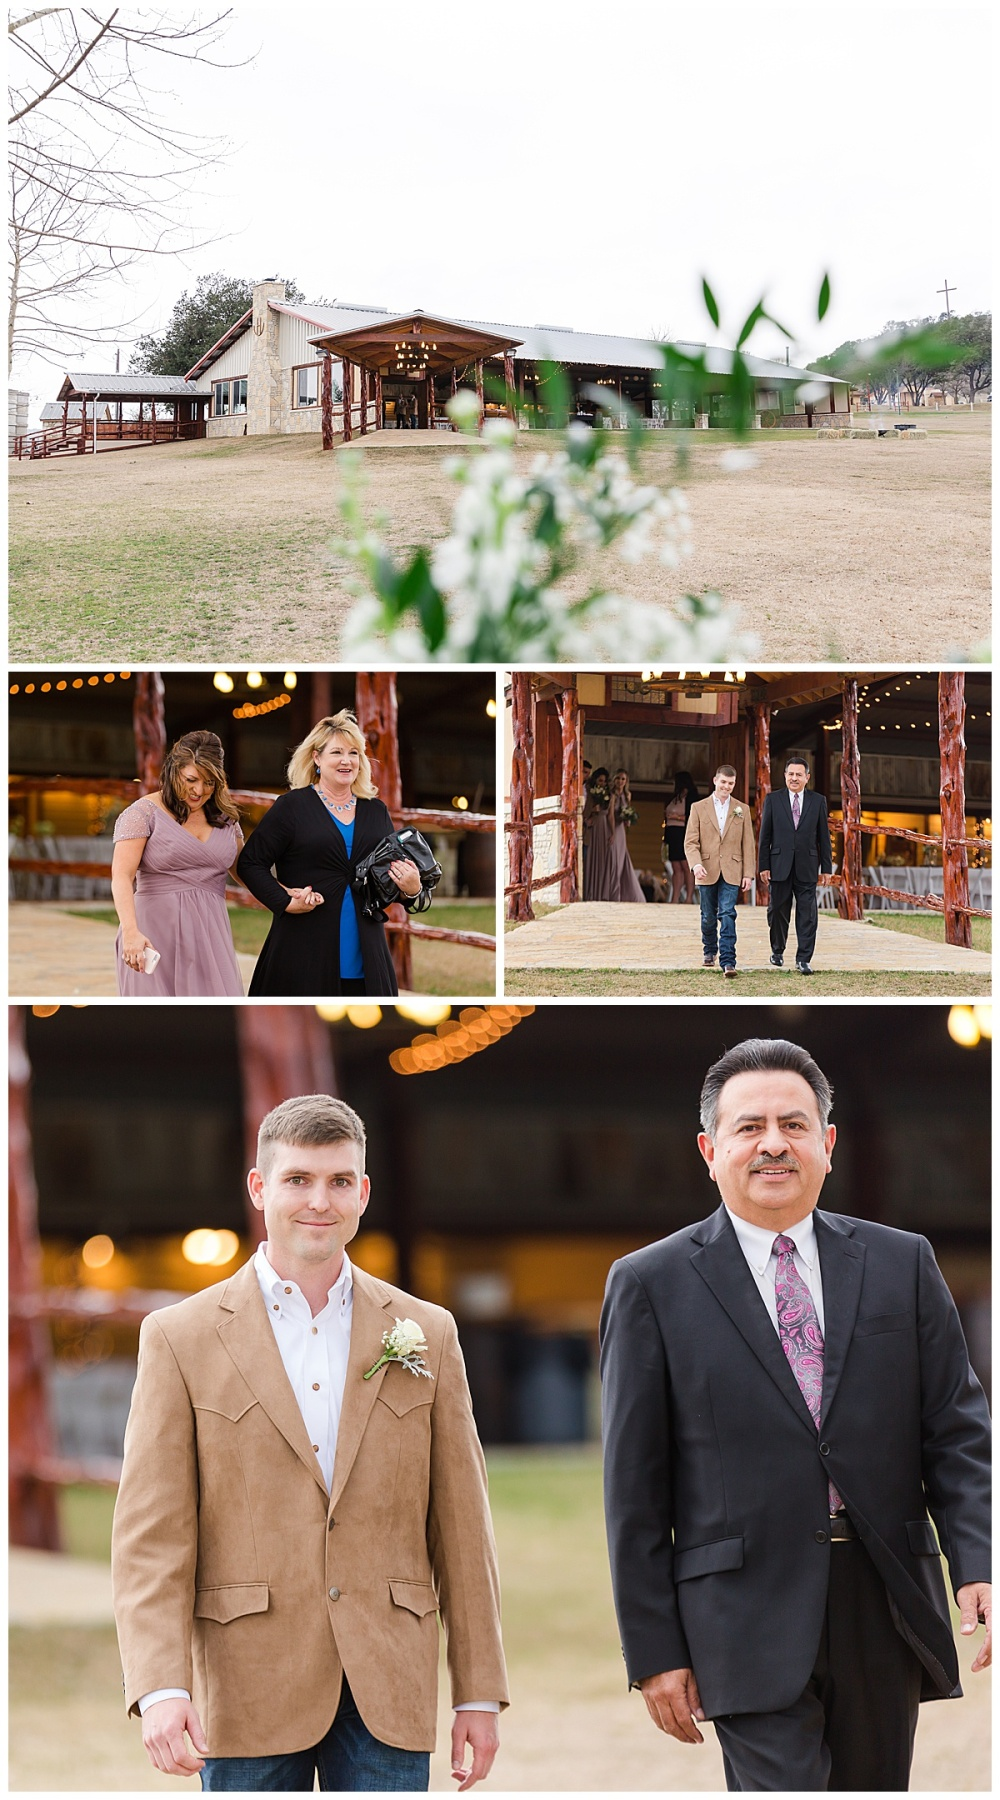 Wedding-Photographer-Texas-Hill-Country-Happy-H-Ranch-Comfor-Texas-Carly-Barton-Photography_0019.jpg